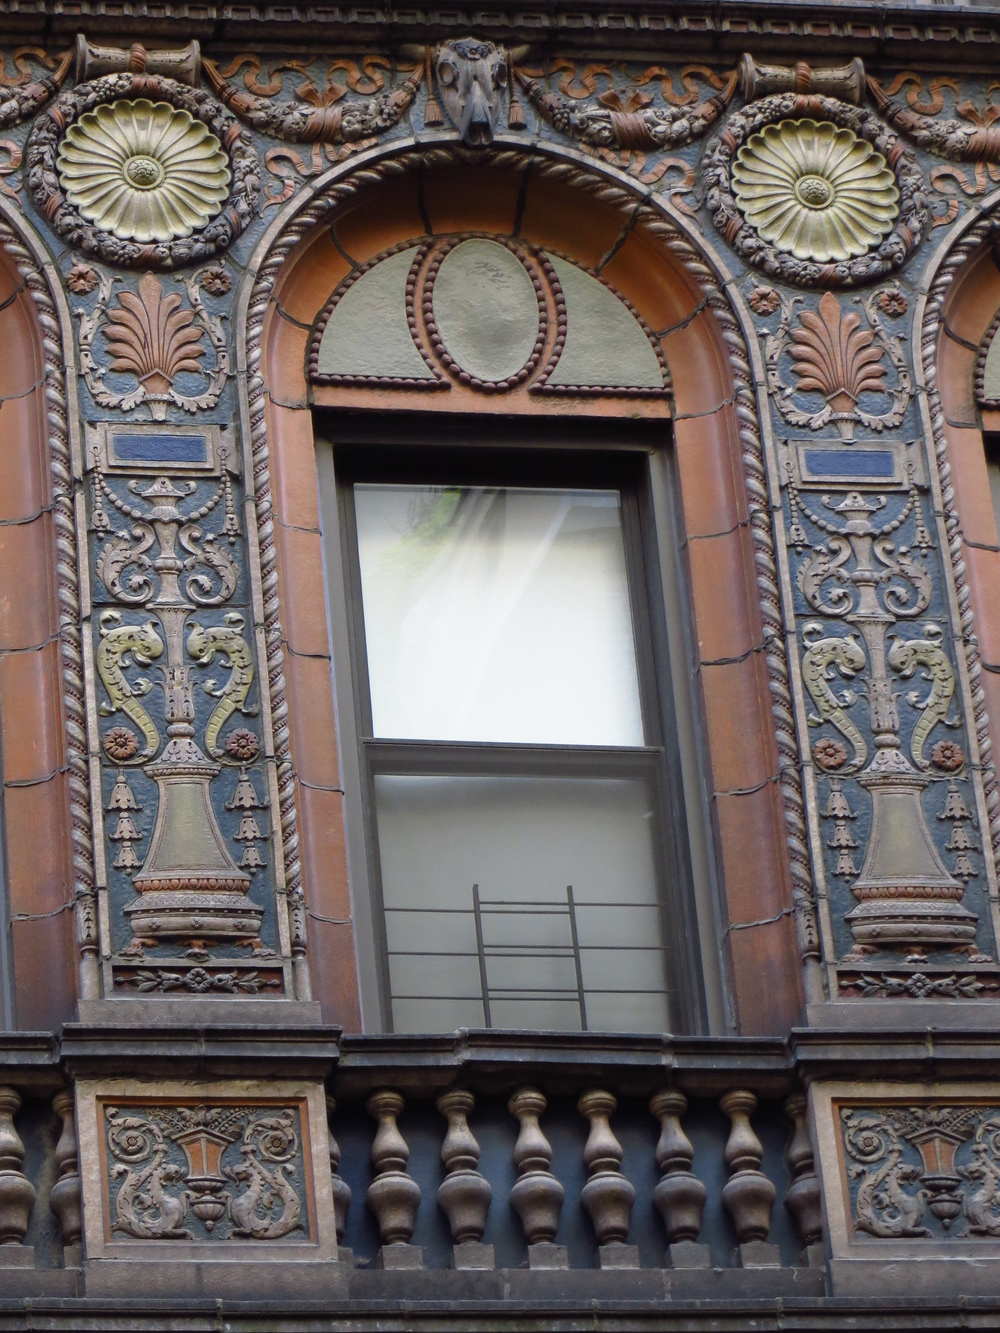 Ornate friezes / bas reliefs